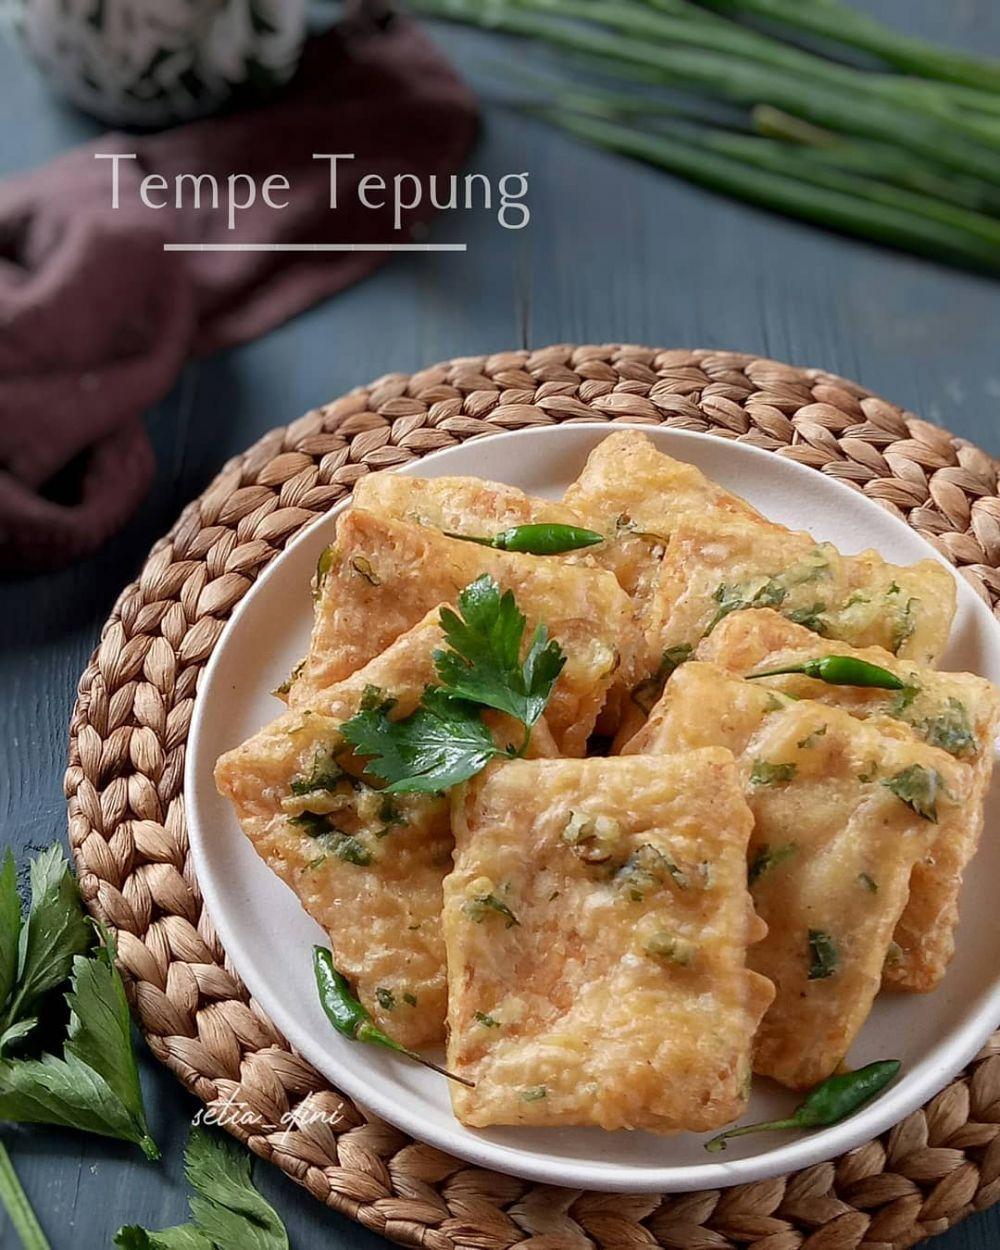 Resep Tempe Goreng Tepung Berbagai Sumber Resep Masakan Resep Tempe Resep Makanan